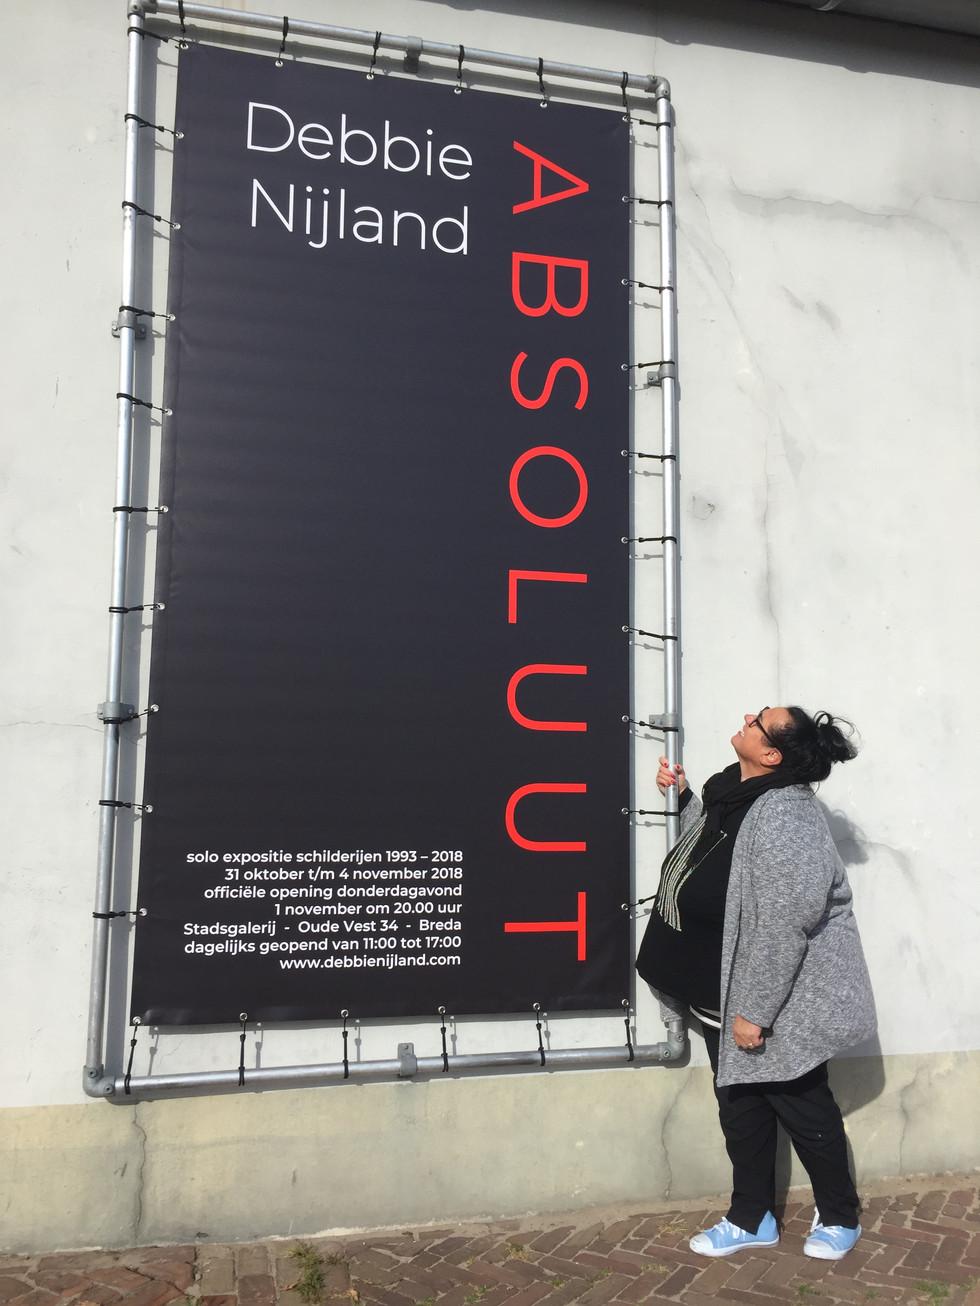 Debbie Nijland Absoluut 2019 Stadsgalerij Breda